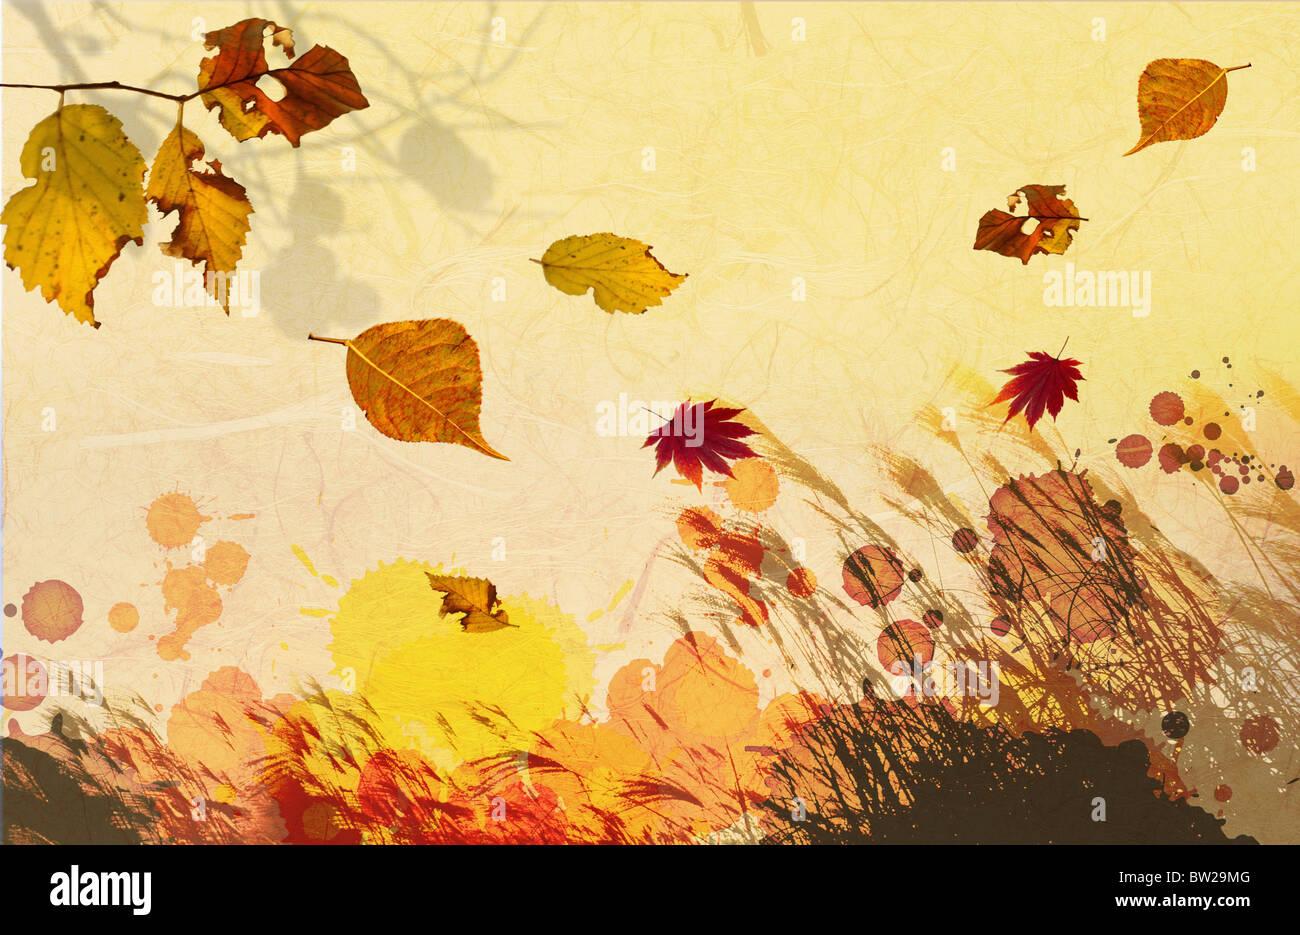 Herbstlaub in Abbildung Stockfoto